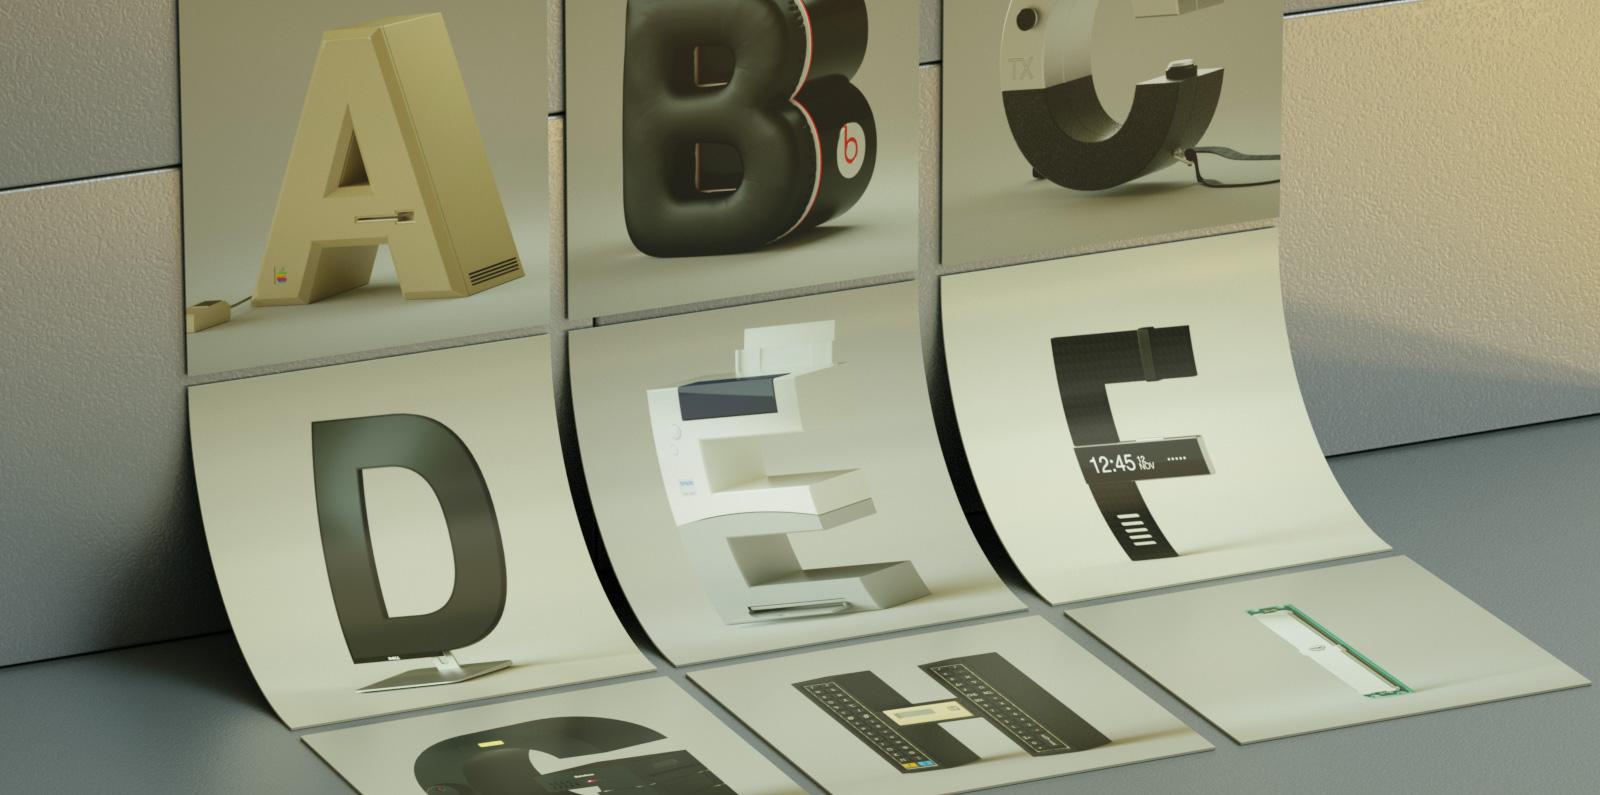 Vinicius Araújo — 36days Electronics